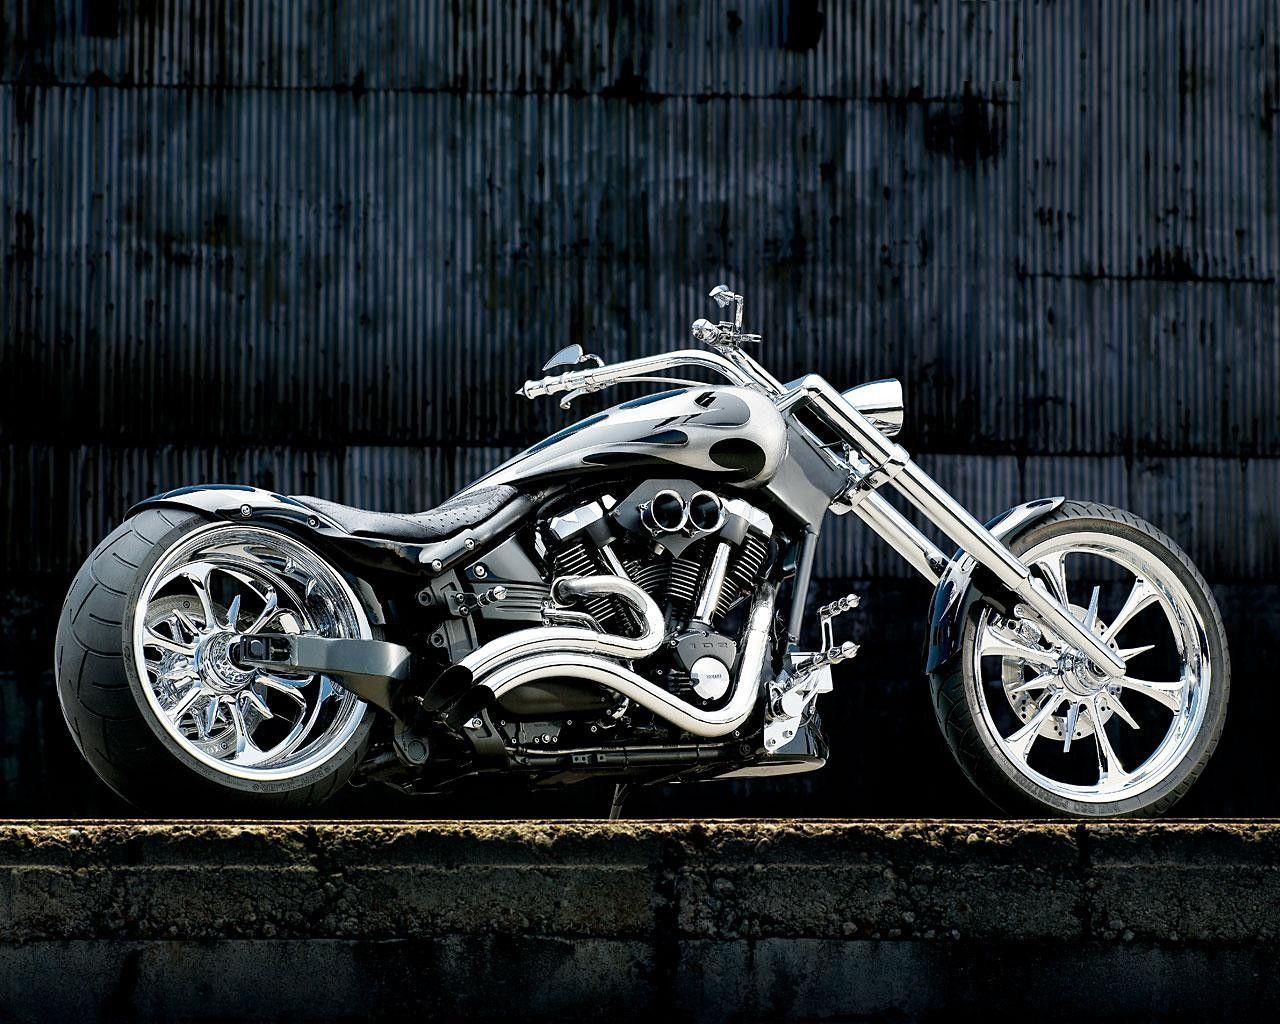 Motorcycle Wallpaper Desktop Backgrounds Chopper Yamaha